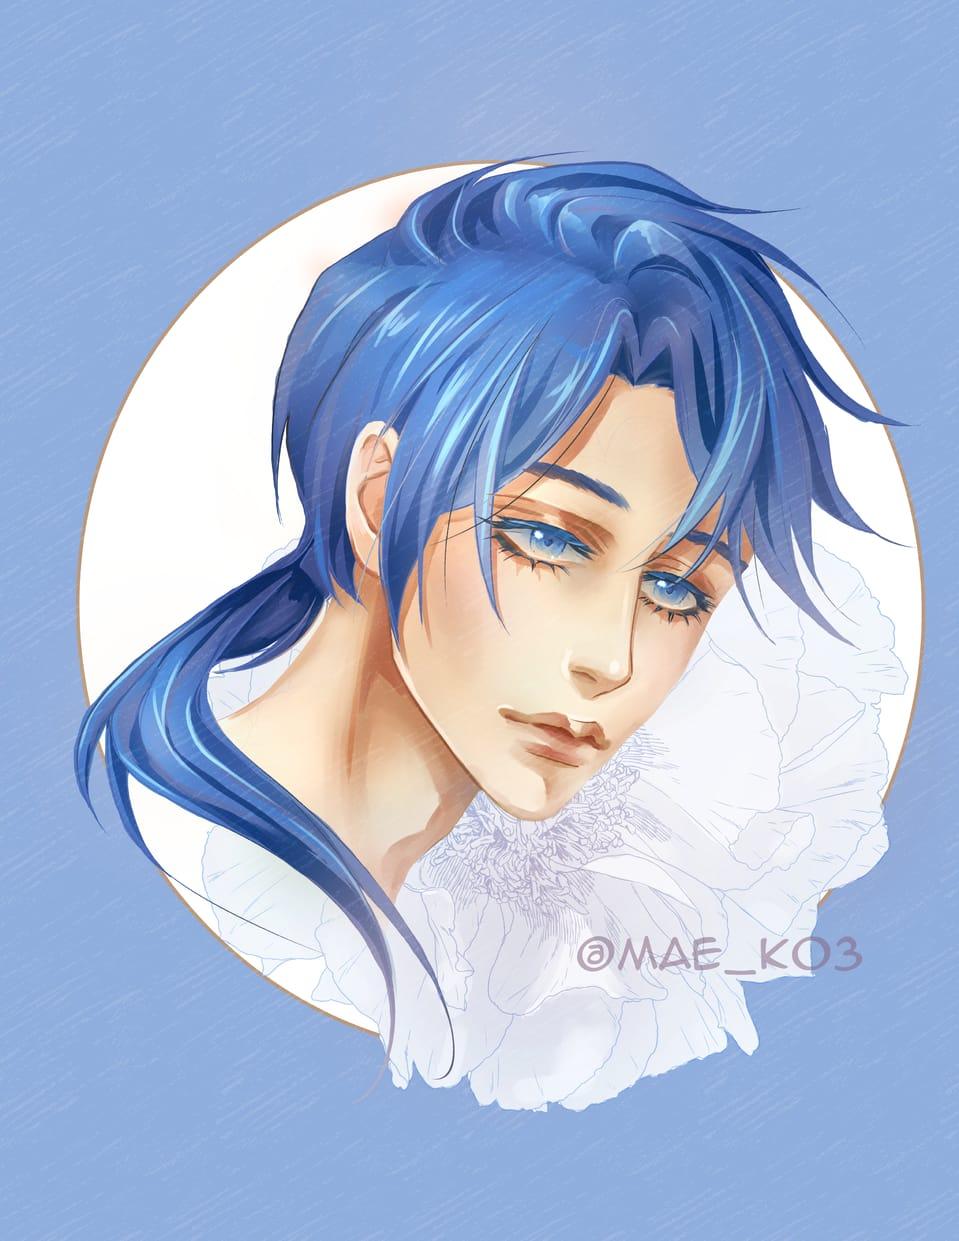 """How to draw manga"" redraw challenge^^ Illust of mae_ko3 boy howtodrawmangaredraw blue artchallenge redraw flower CLIPSTUDIOPAINT redrawchallenge 美少年 bluehair"